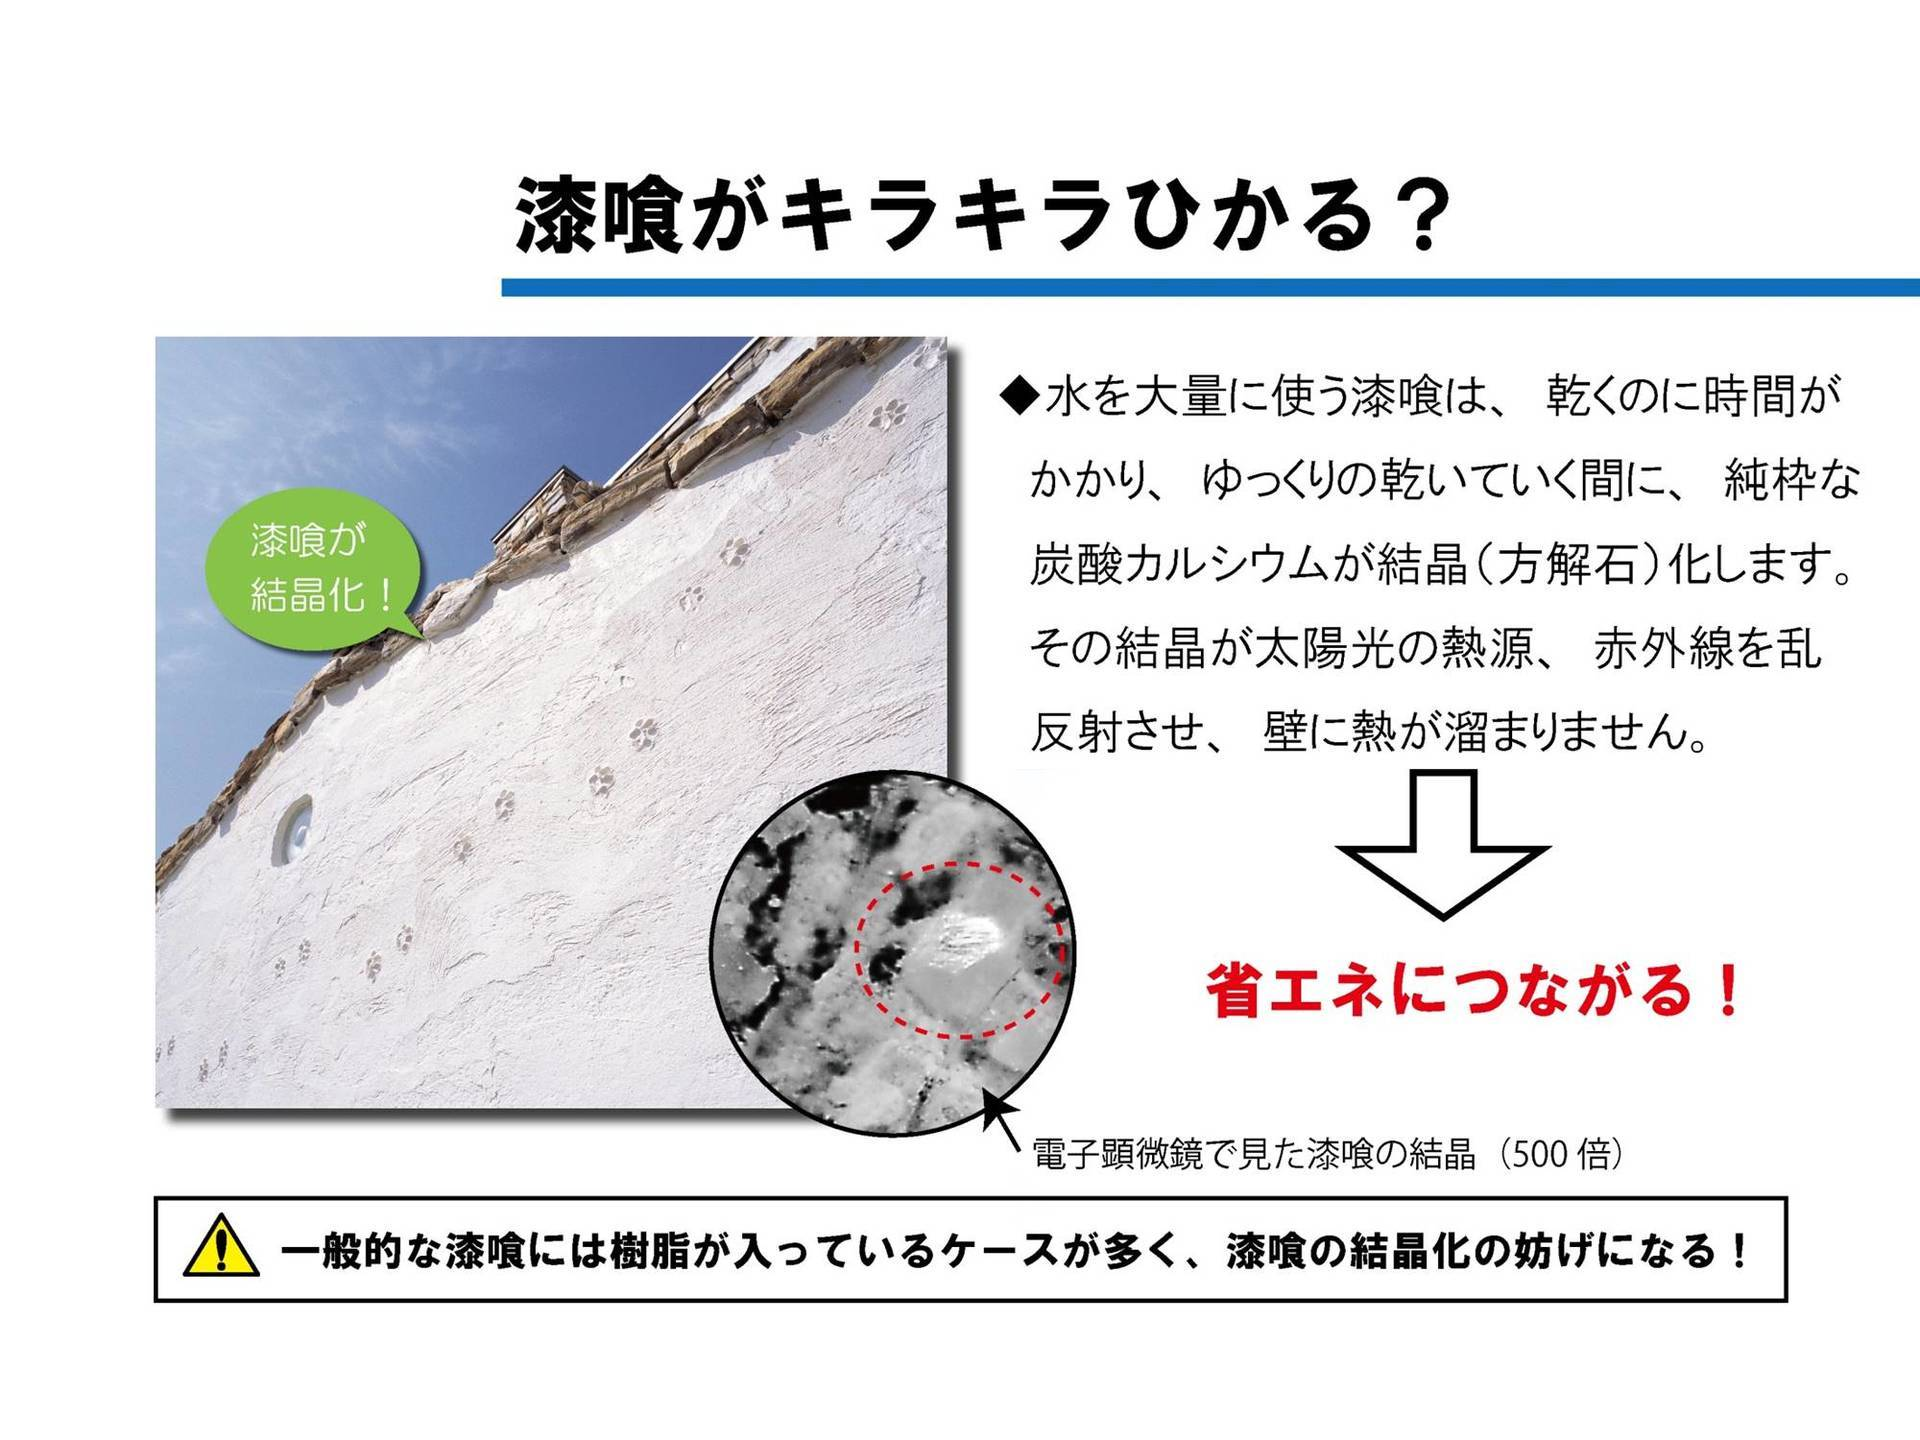 Aスライド34.JPG